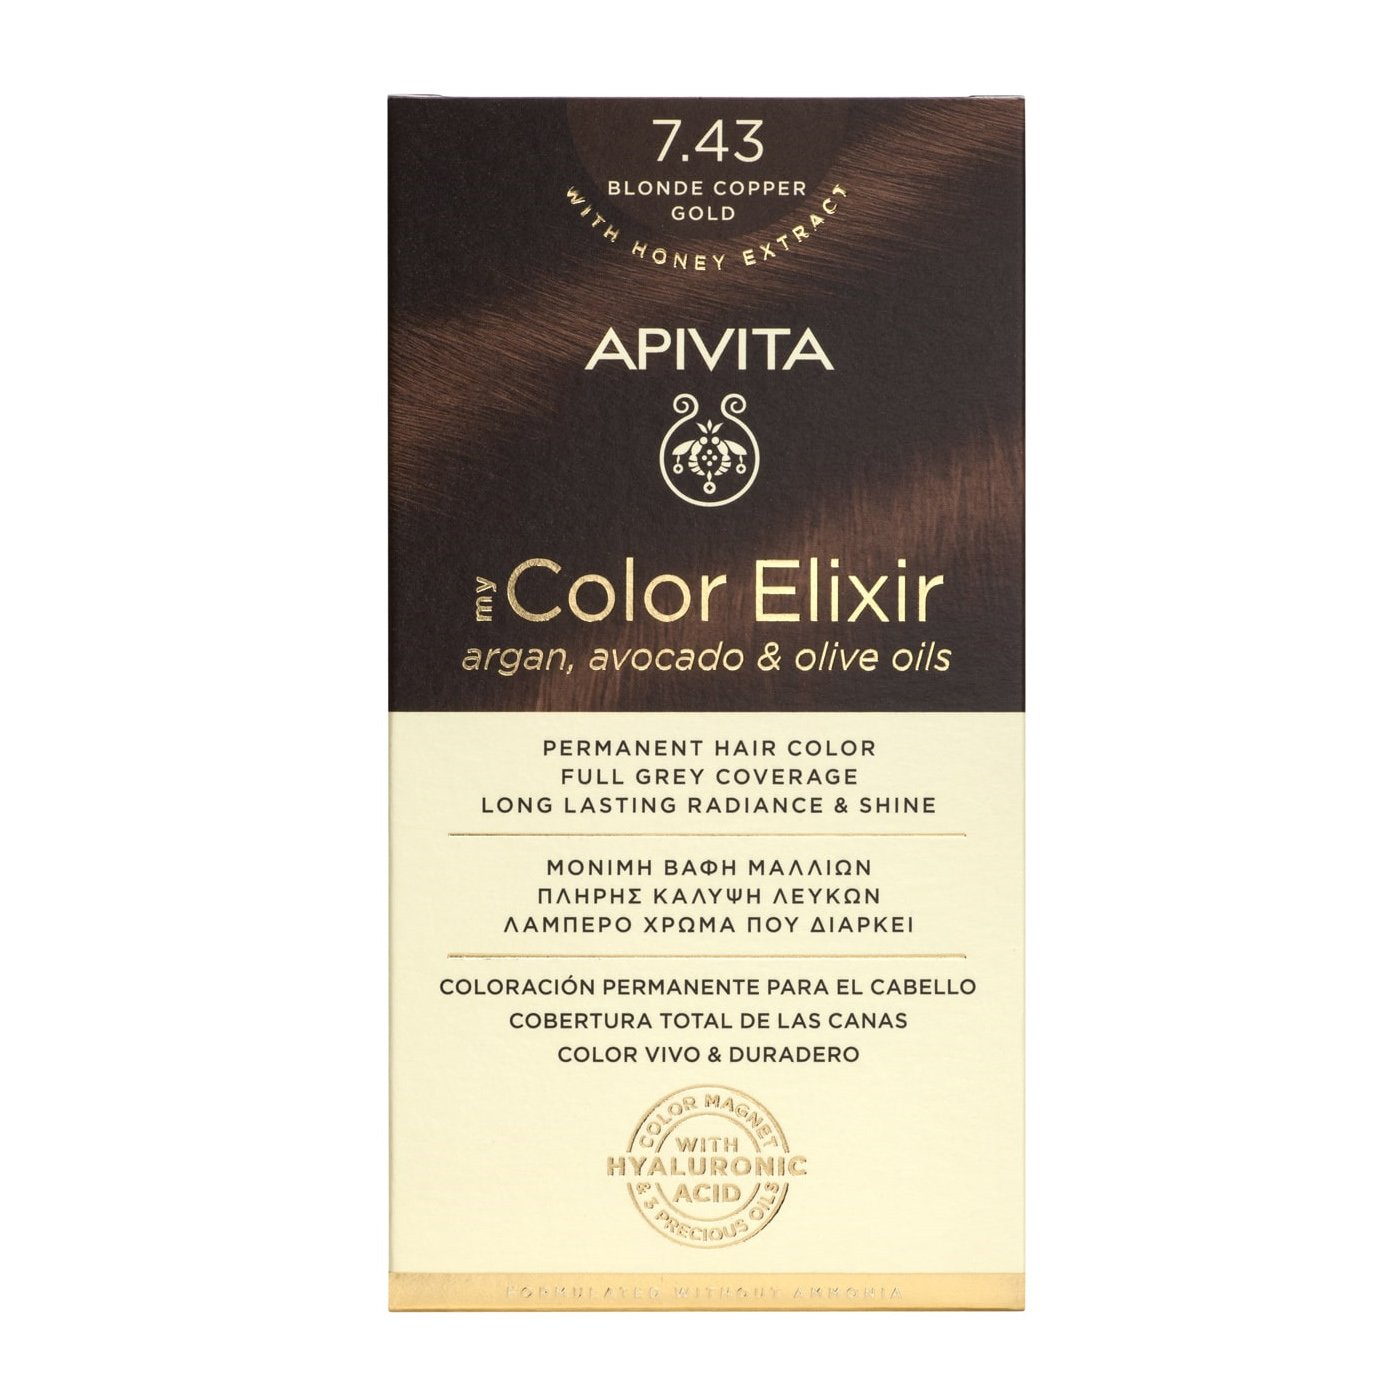 Apivita My Color Elixir Μόνιμη Βαφή Μαλλιών με Καινοτόμο Σύστημα Color Magnet που Σταθεροποιεί και Σφραγίζει το Χρώμα στην Τρίχα – Ν 7.43 ΞΑΝΘΟ ΧΑΛΚΙΝΟ ΜΕΛΙ